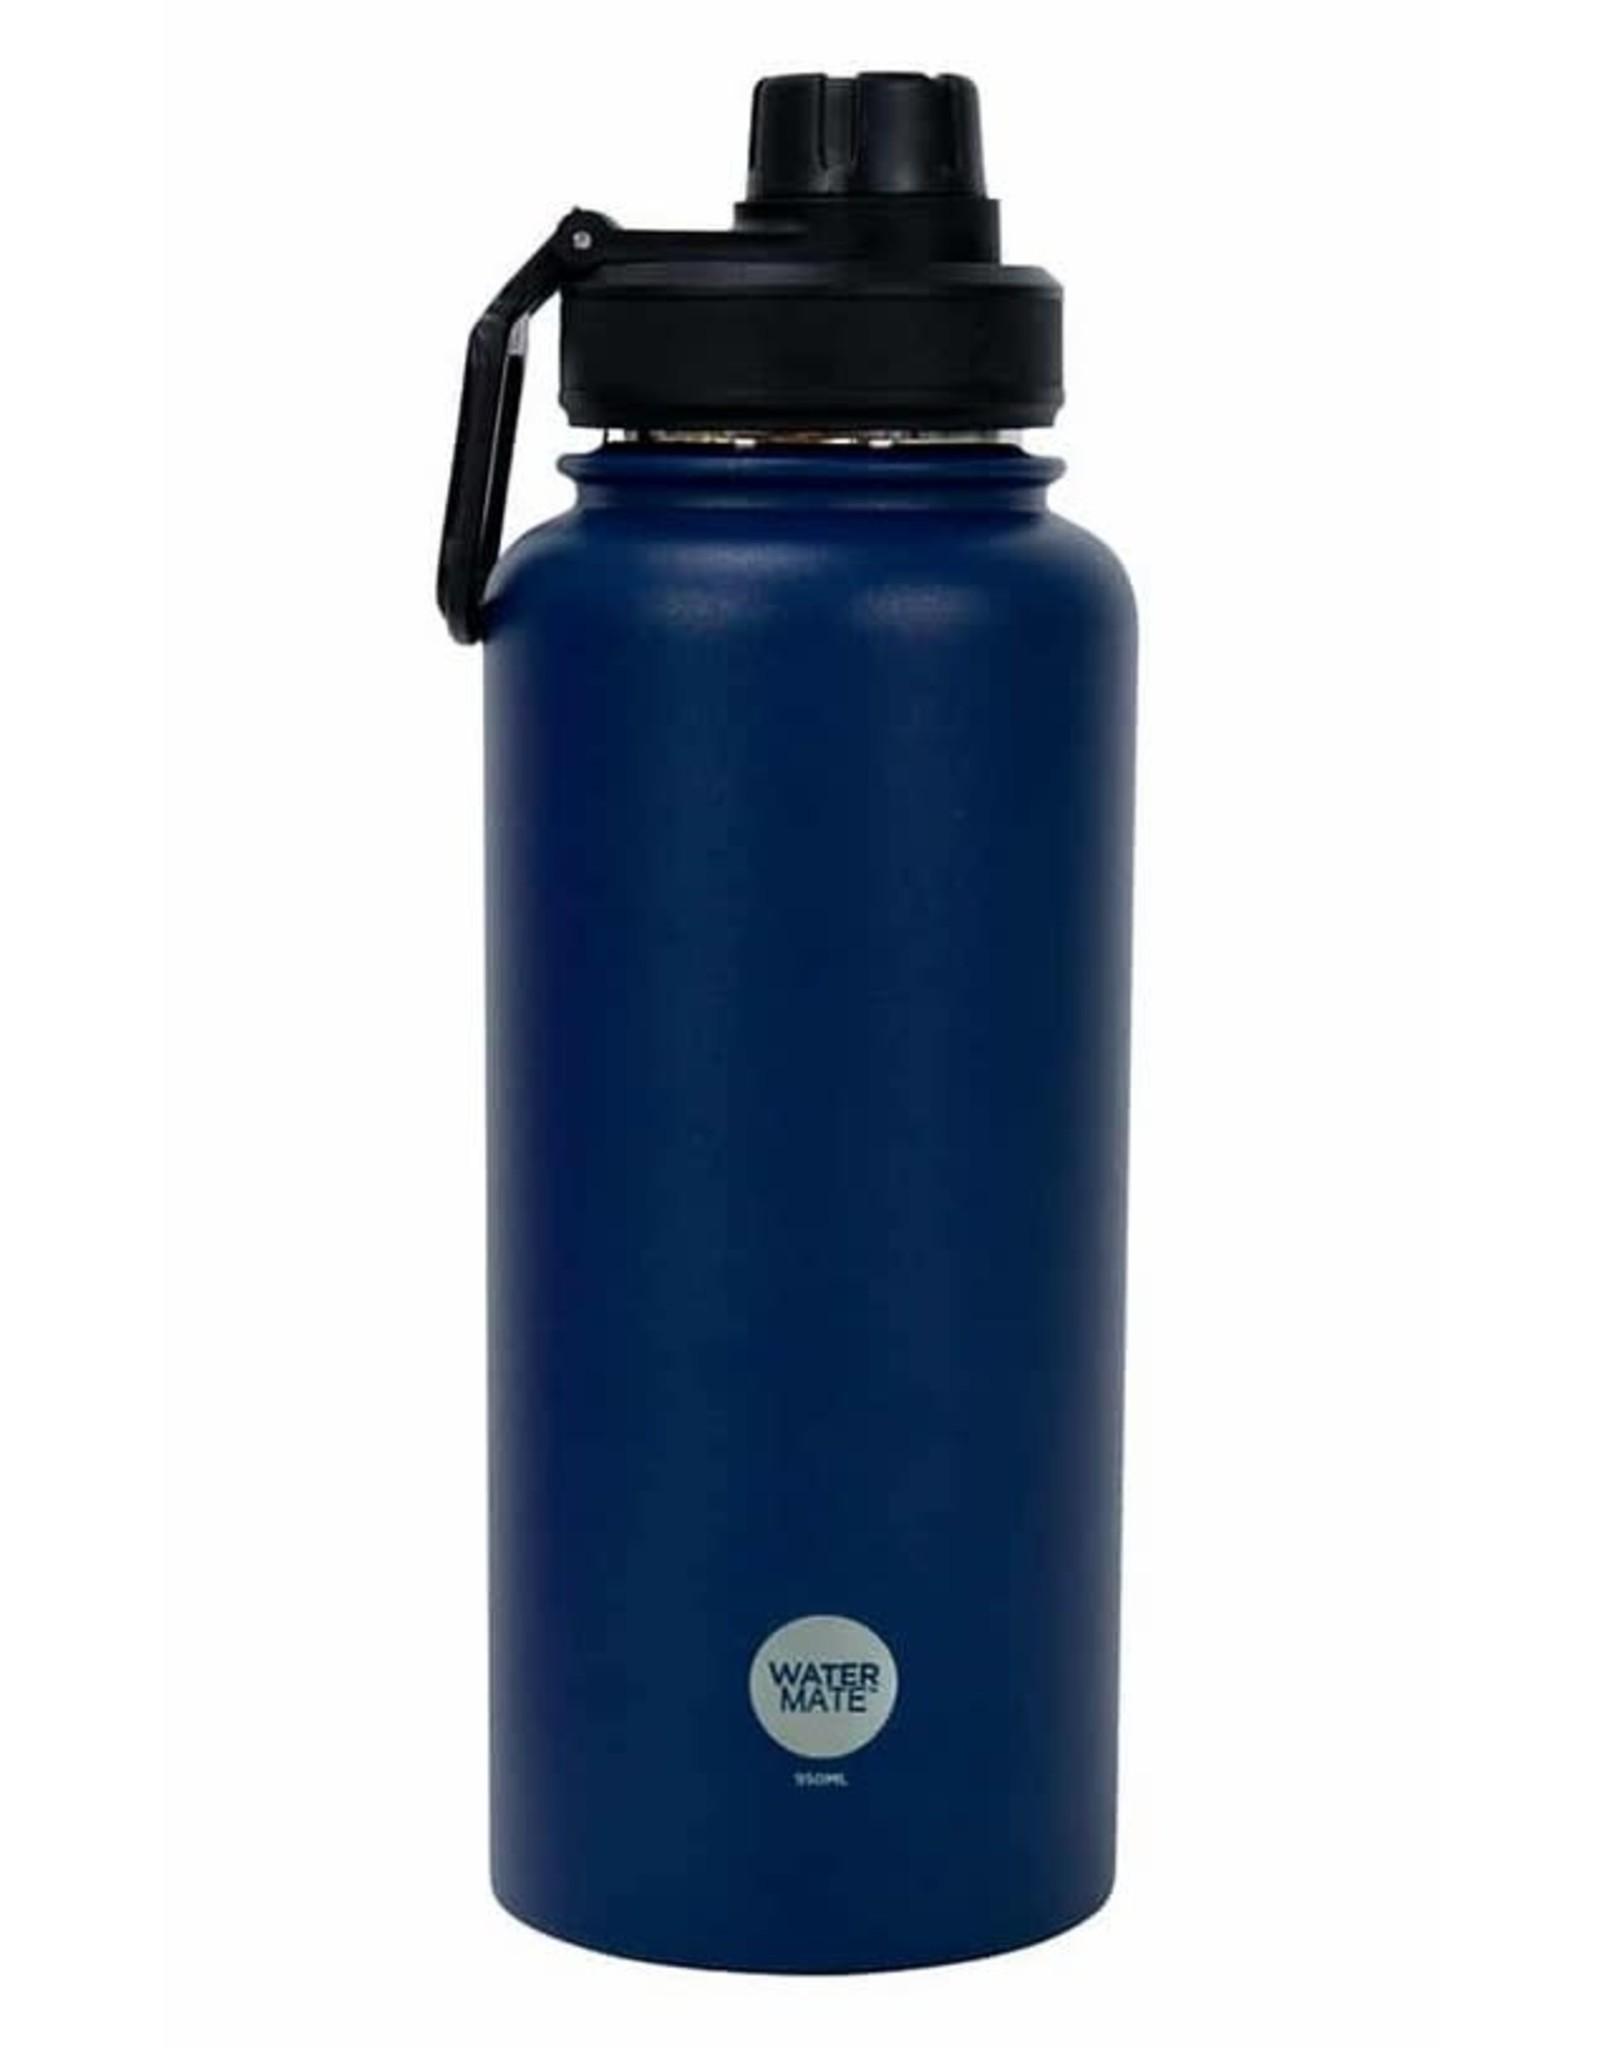 Watermate Stainless Steel Drinking Bottle